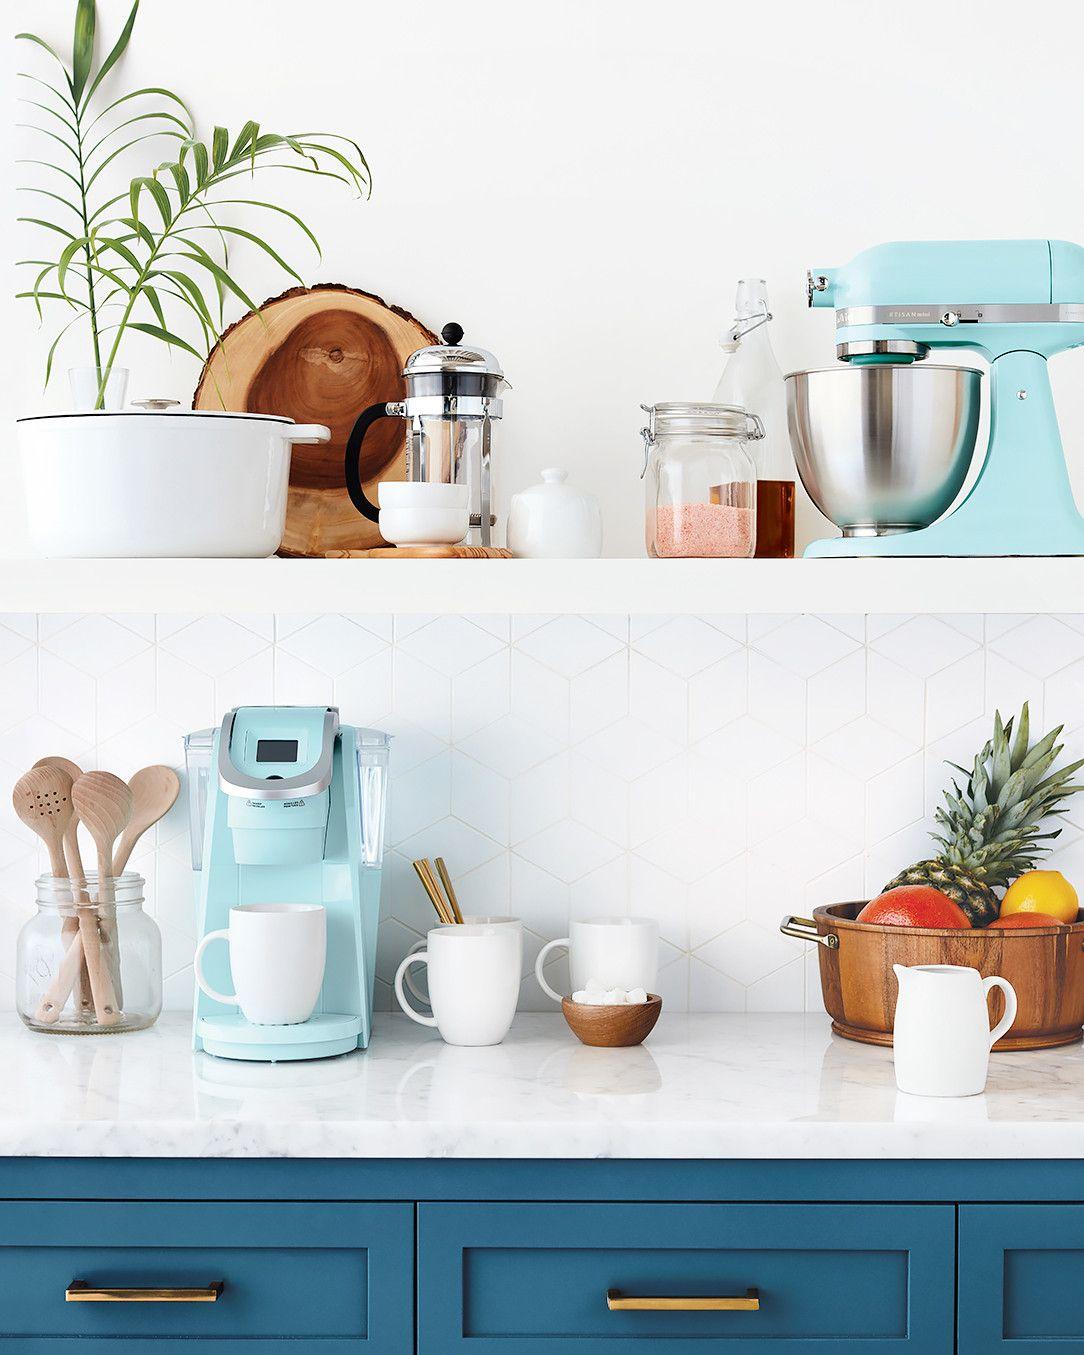 Decor Trends Kitchen Cabinet Inspiration Target Kitchen Target Home Decor